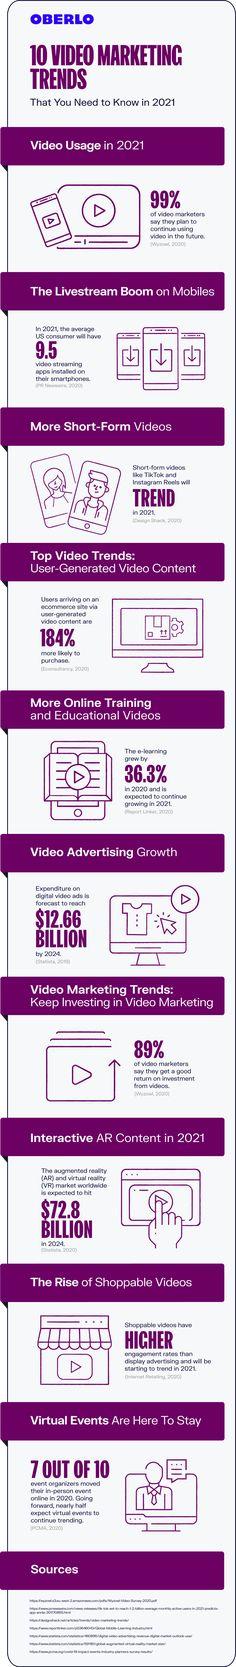 [INFOGRAPHIC] Infográfico | Vídeos tendência para 2021 | Trends Social Media Video, Social Media Trends, Business Marketing, Social Media Marketing, Social Networks, Social Media Advantages, Pr Newswire, Video Advertising, Video Site